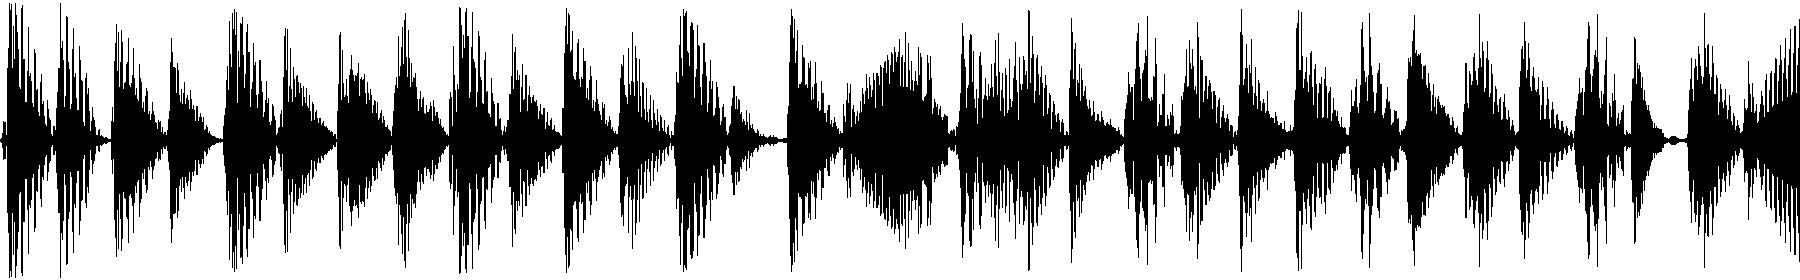 bass loop a 125